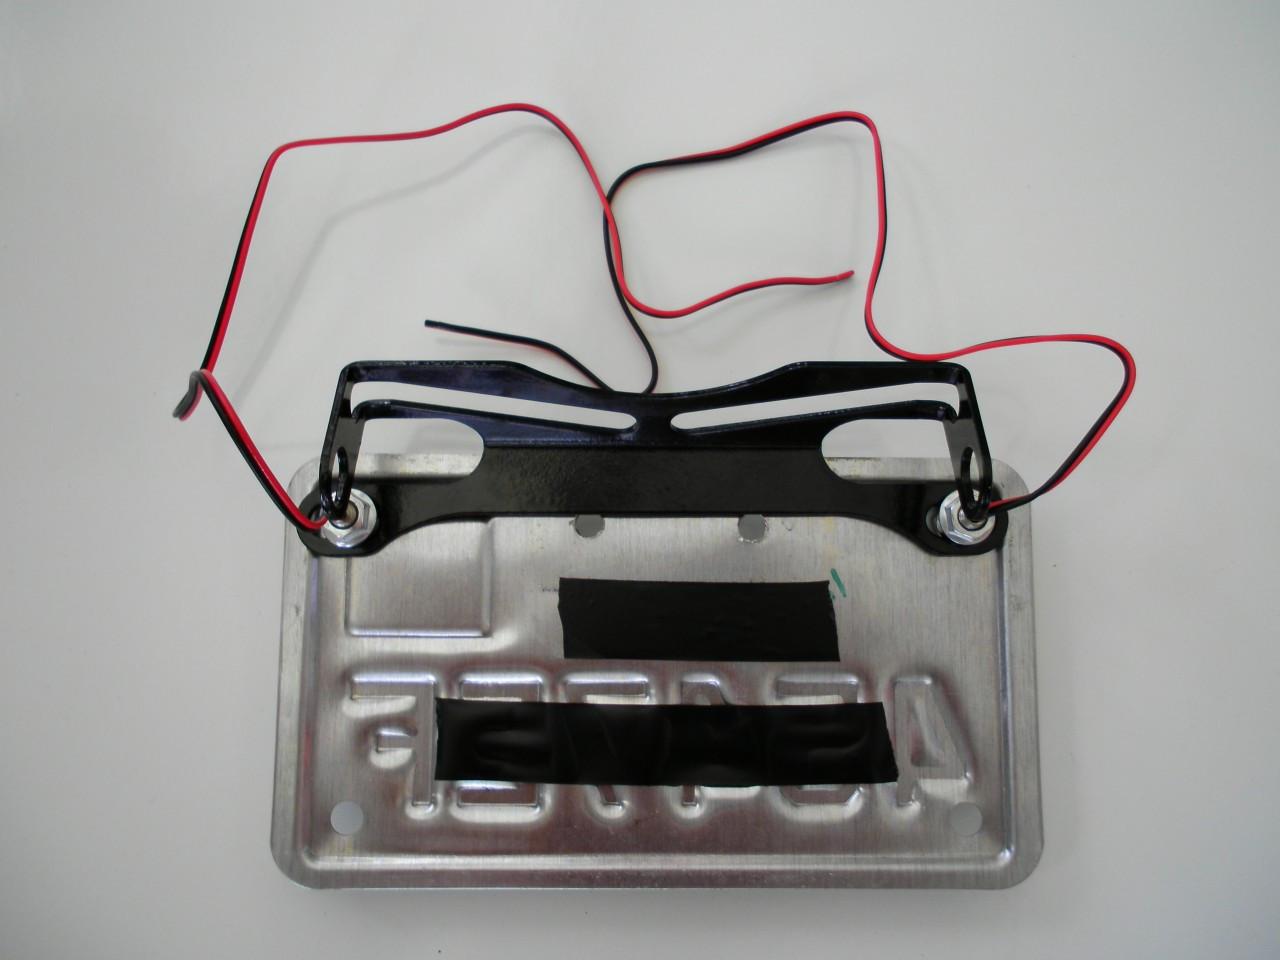 Hyosung Atk Fender Eliminator Kit United Motors Kasinski 2005 Gt 650 Wiring Diagram